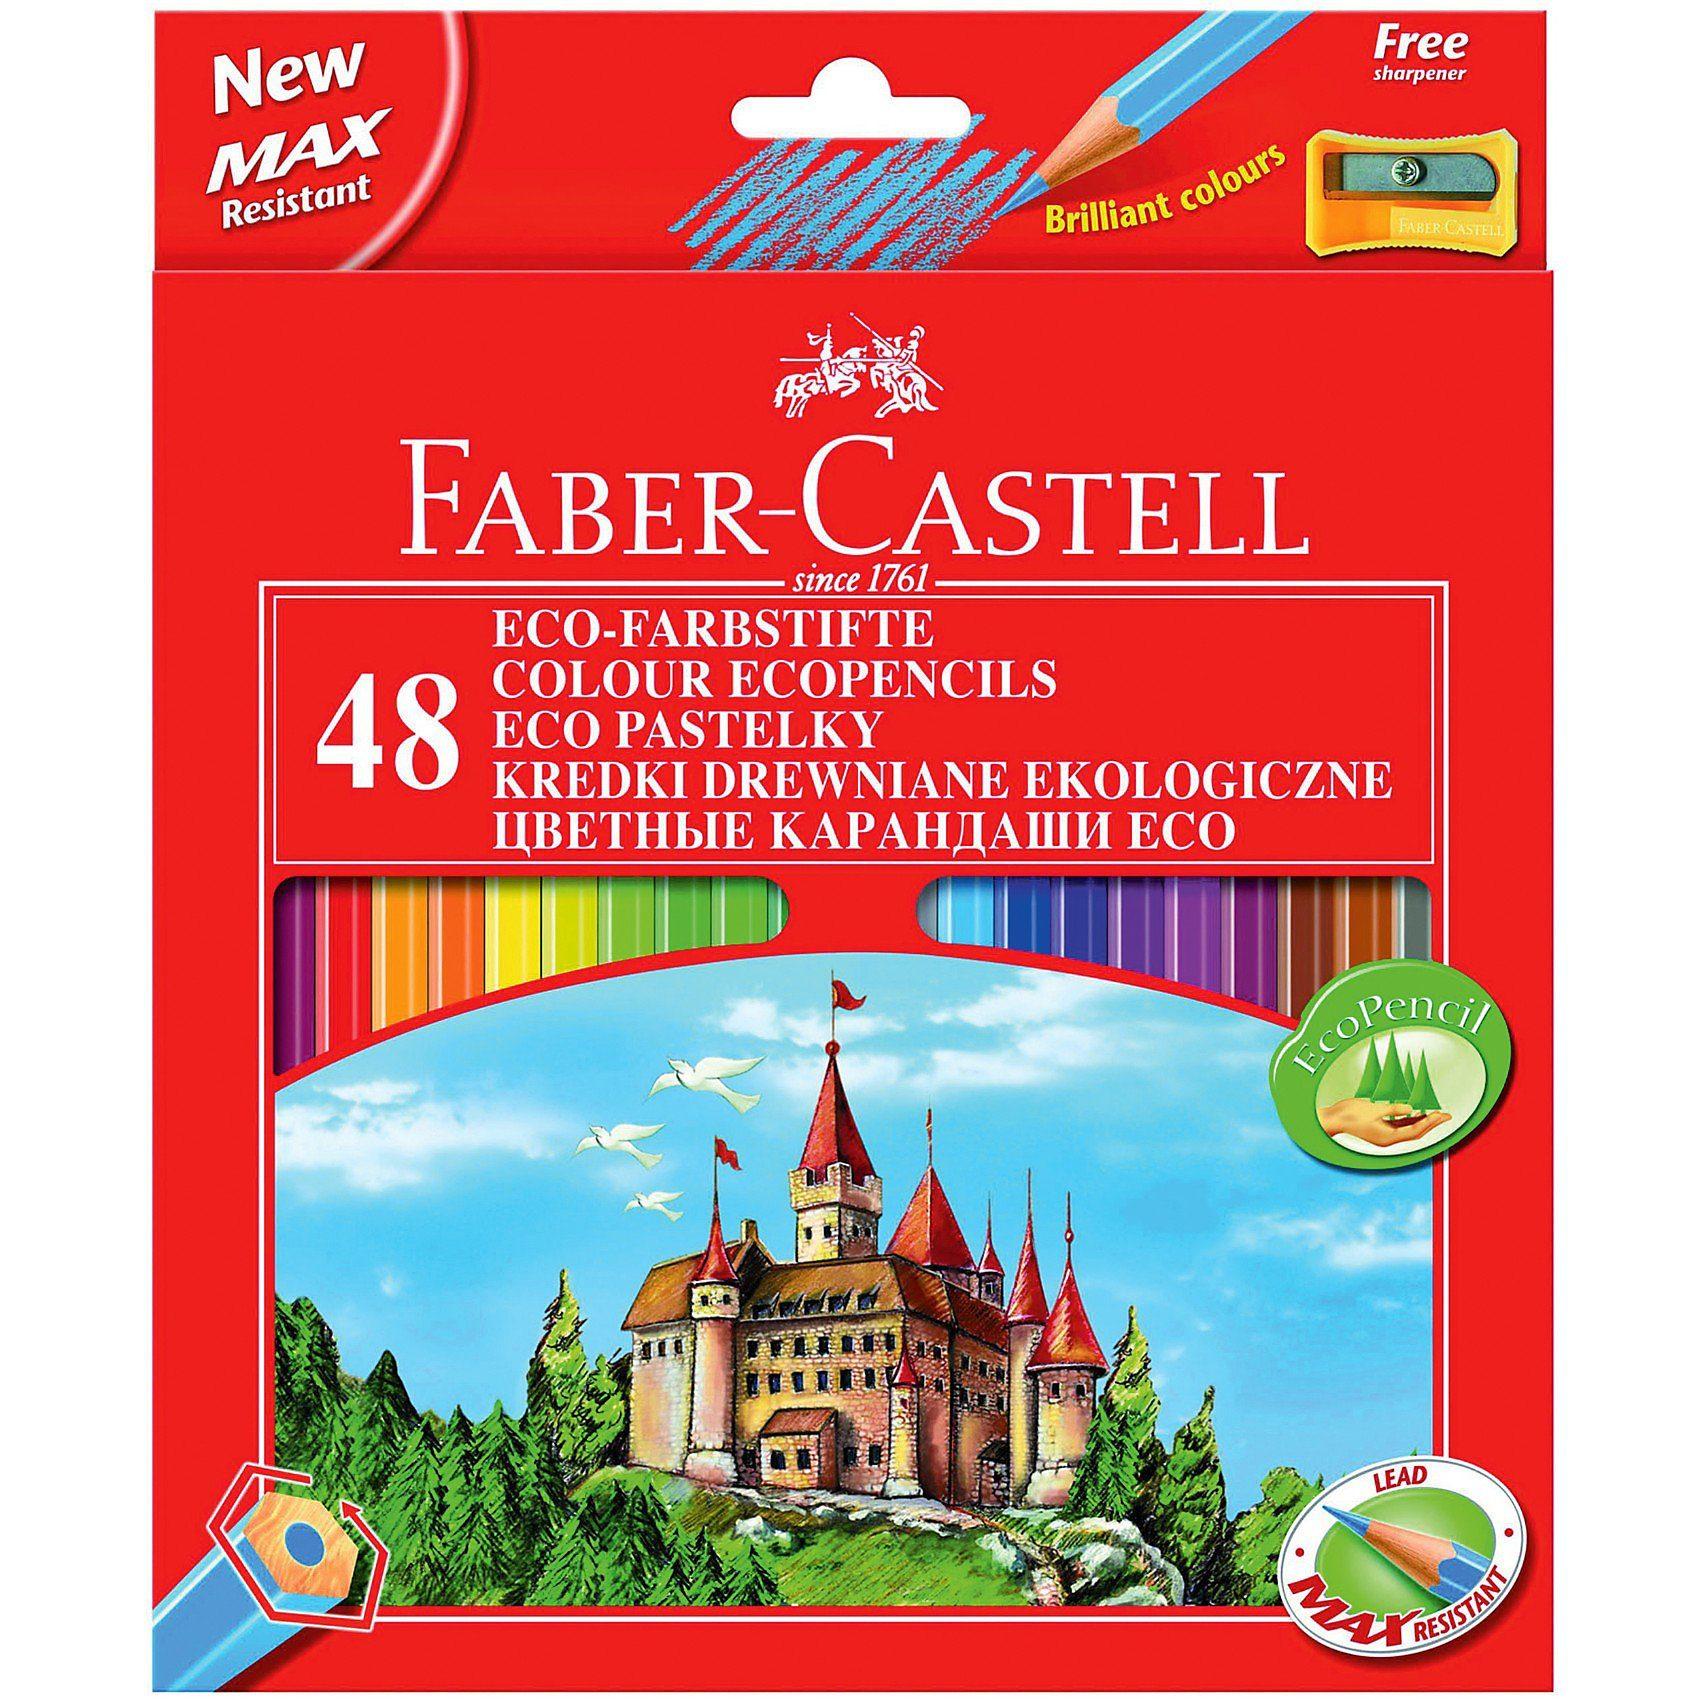 Faber-Castell ECO-Buntstifte, 48 Farben inkl. Spitzer